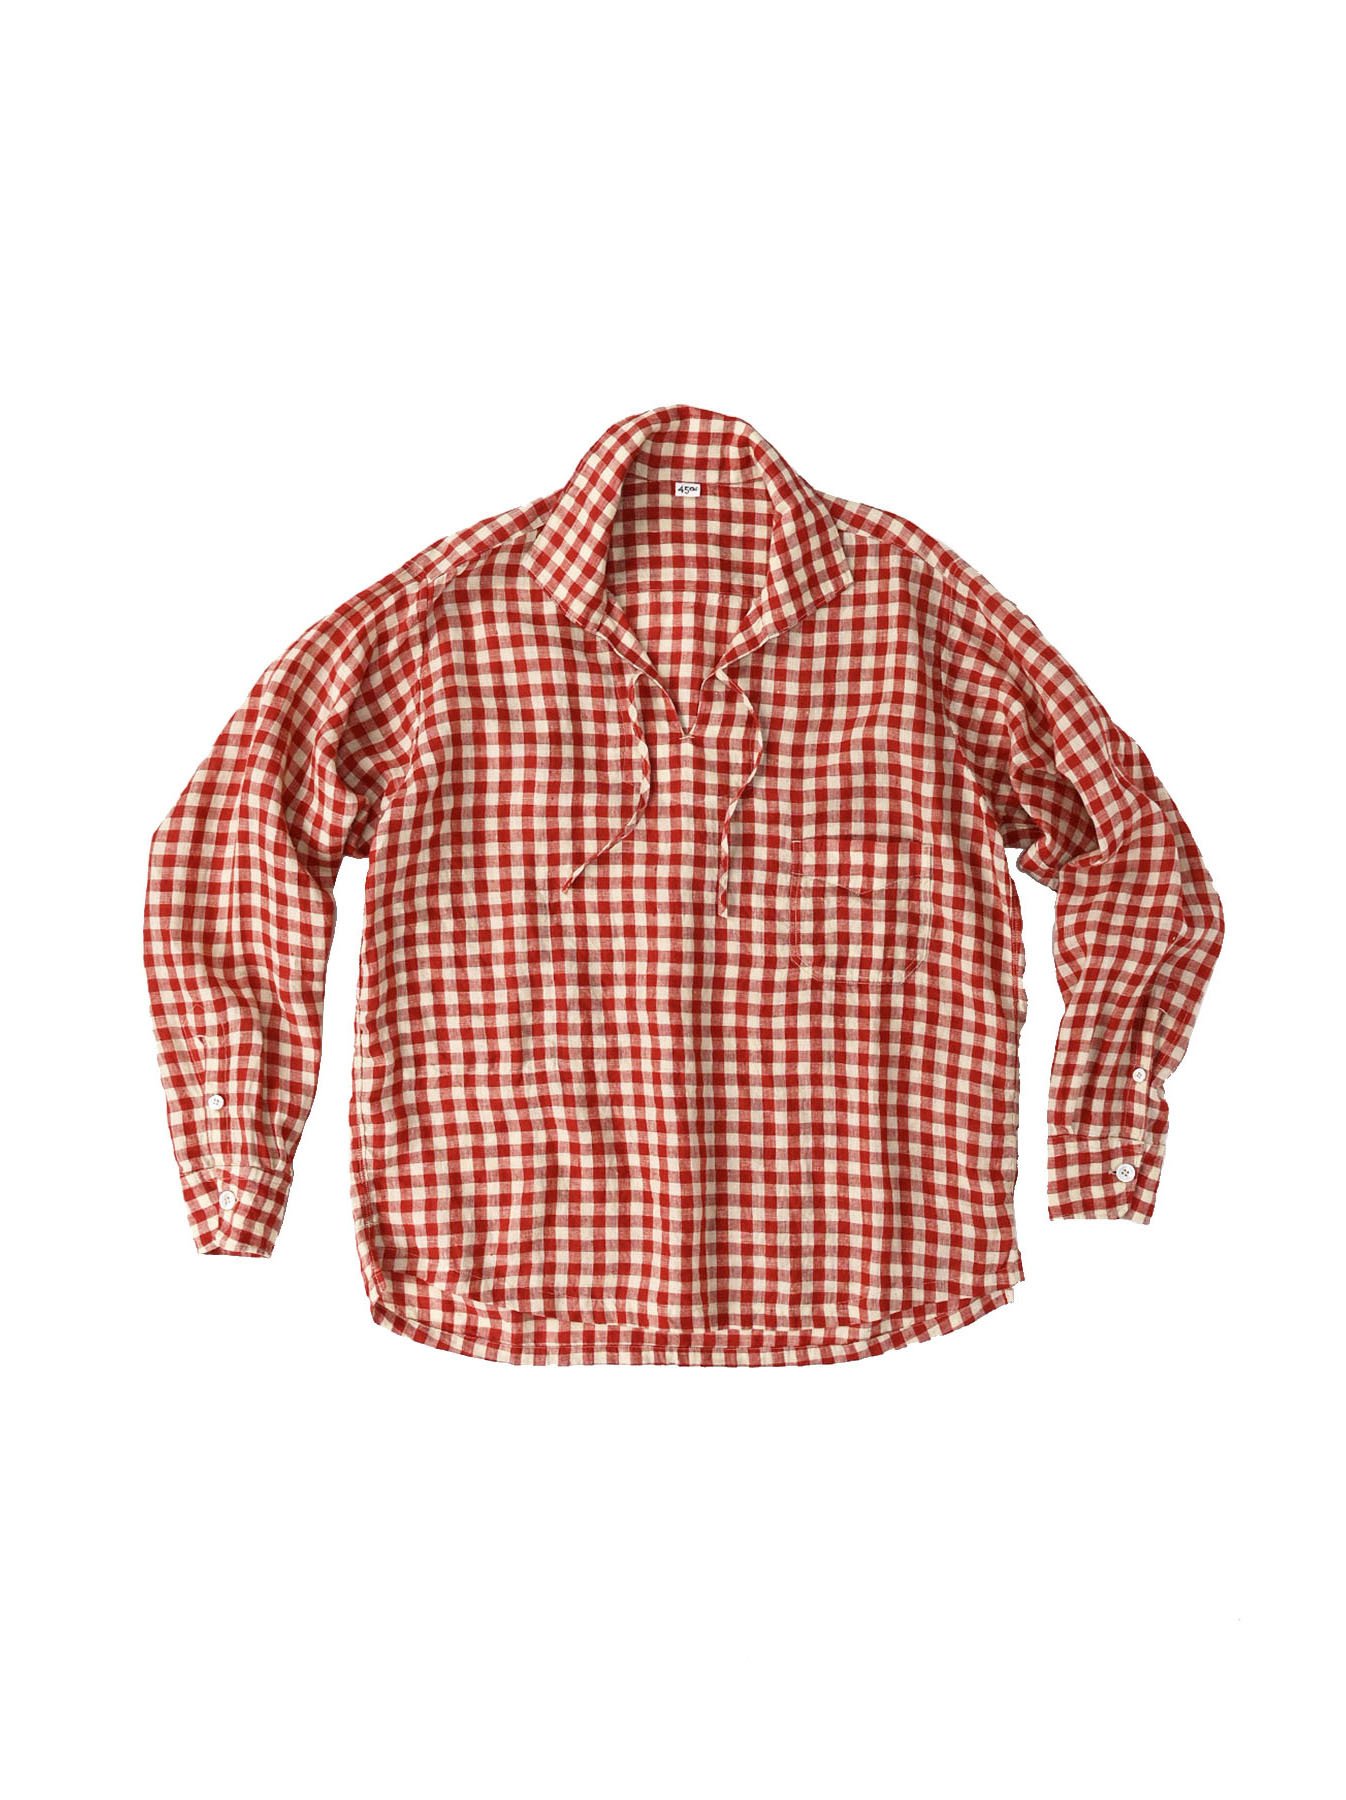 Indian Gauze Linen Capri Shirt-1